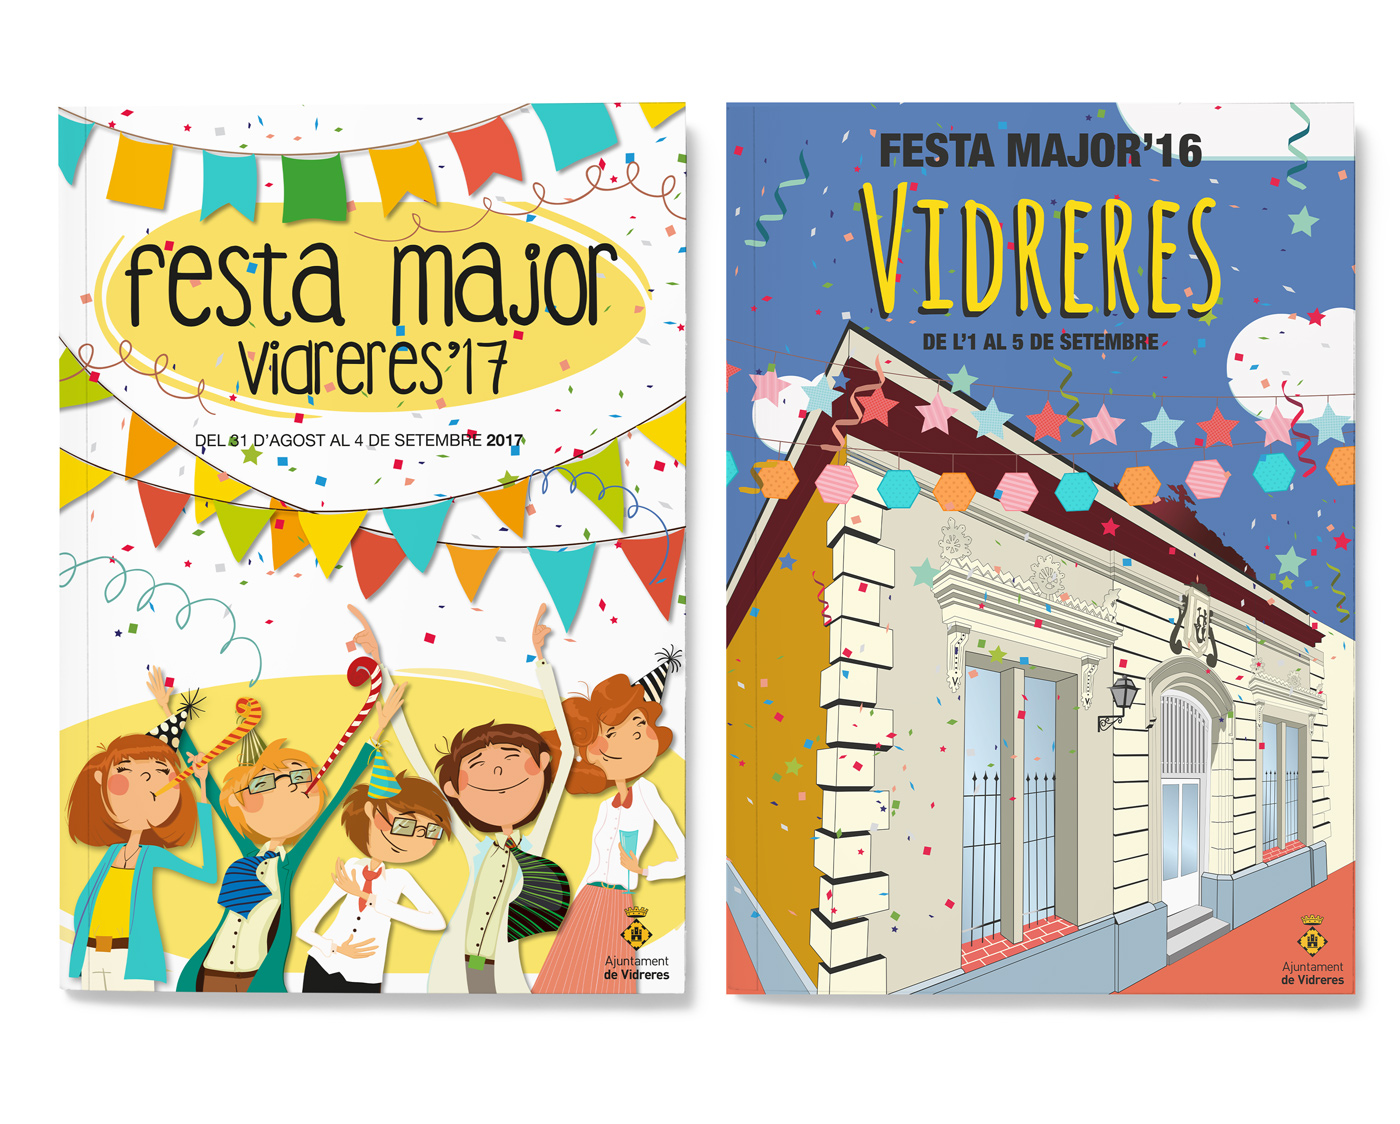 festa_major-vidreres2